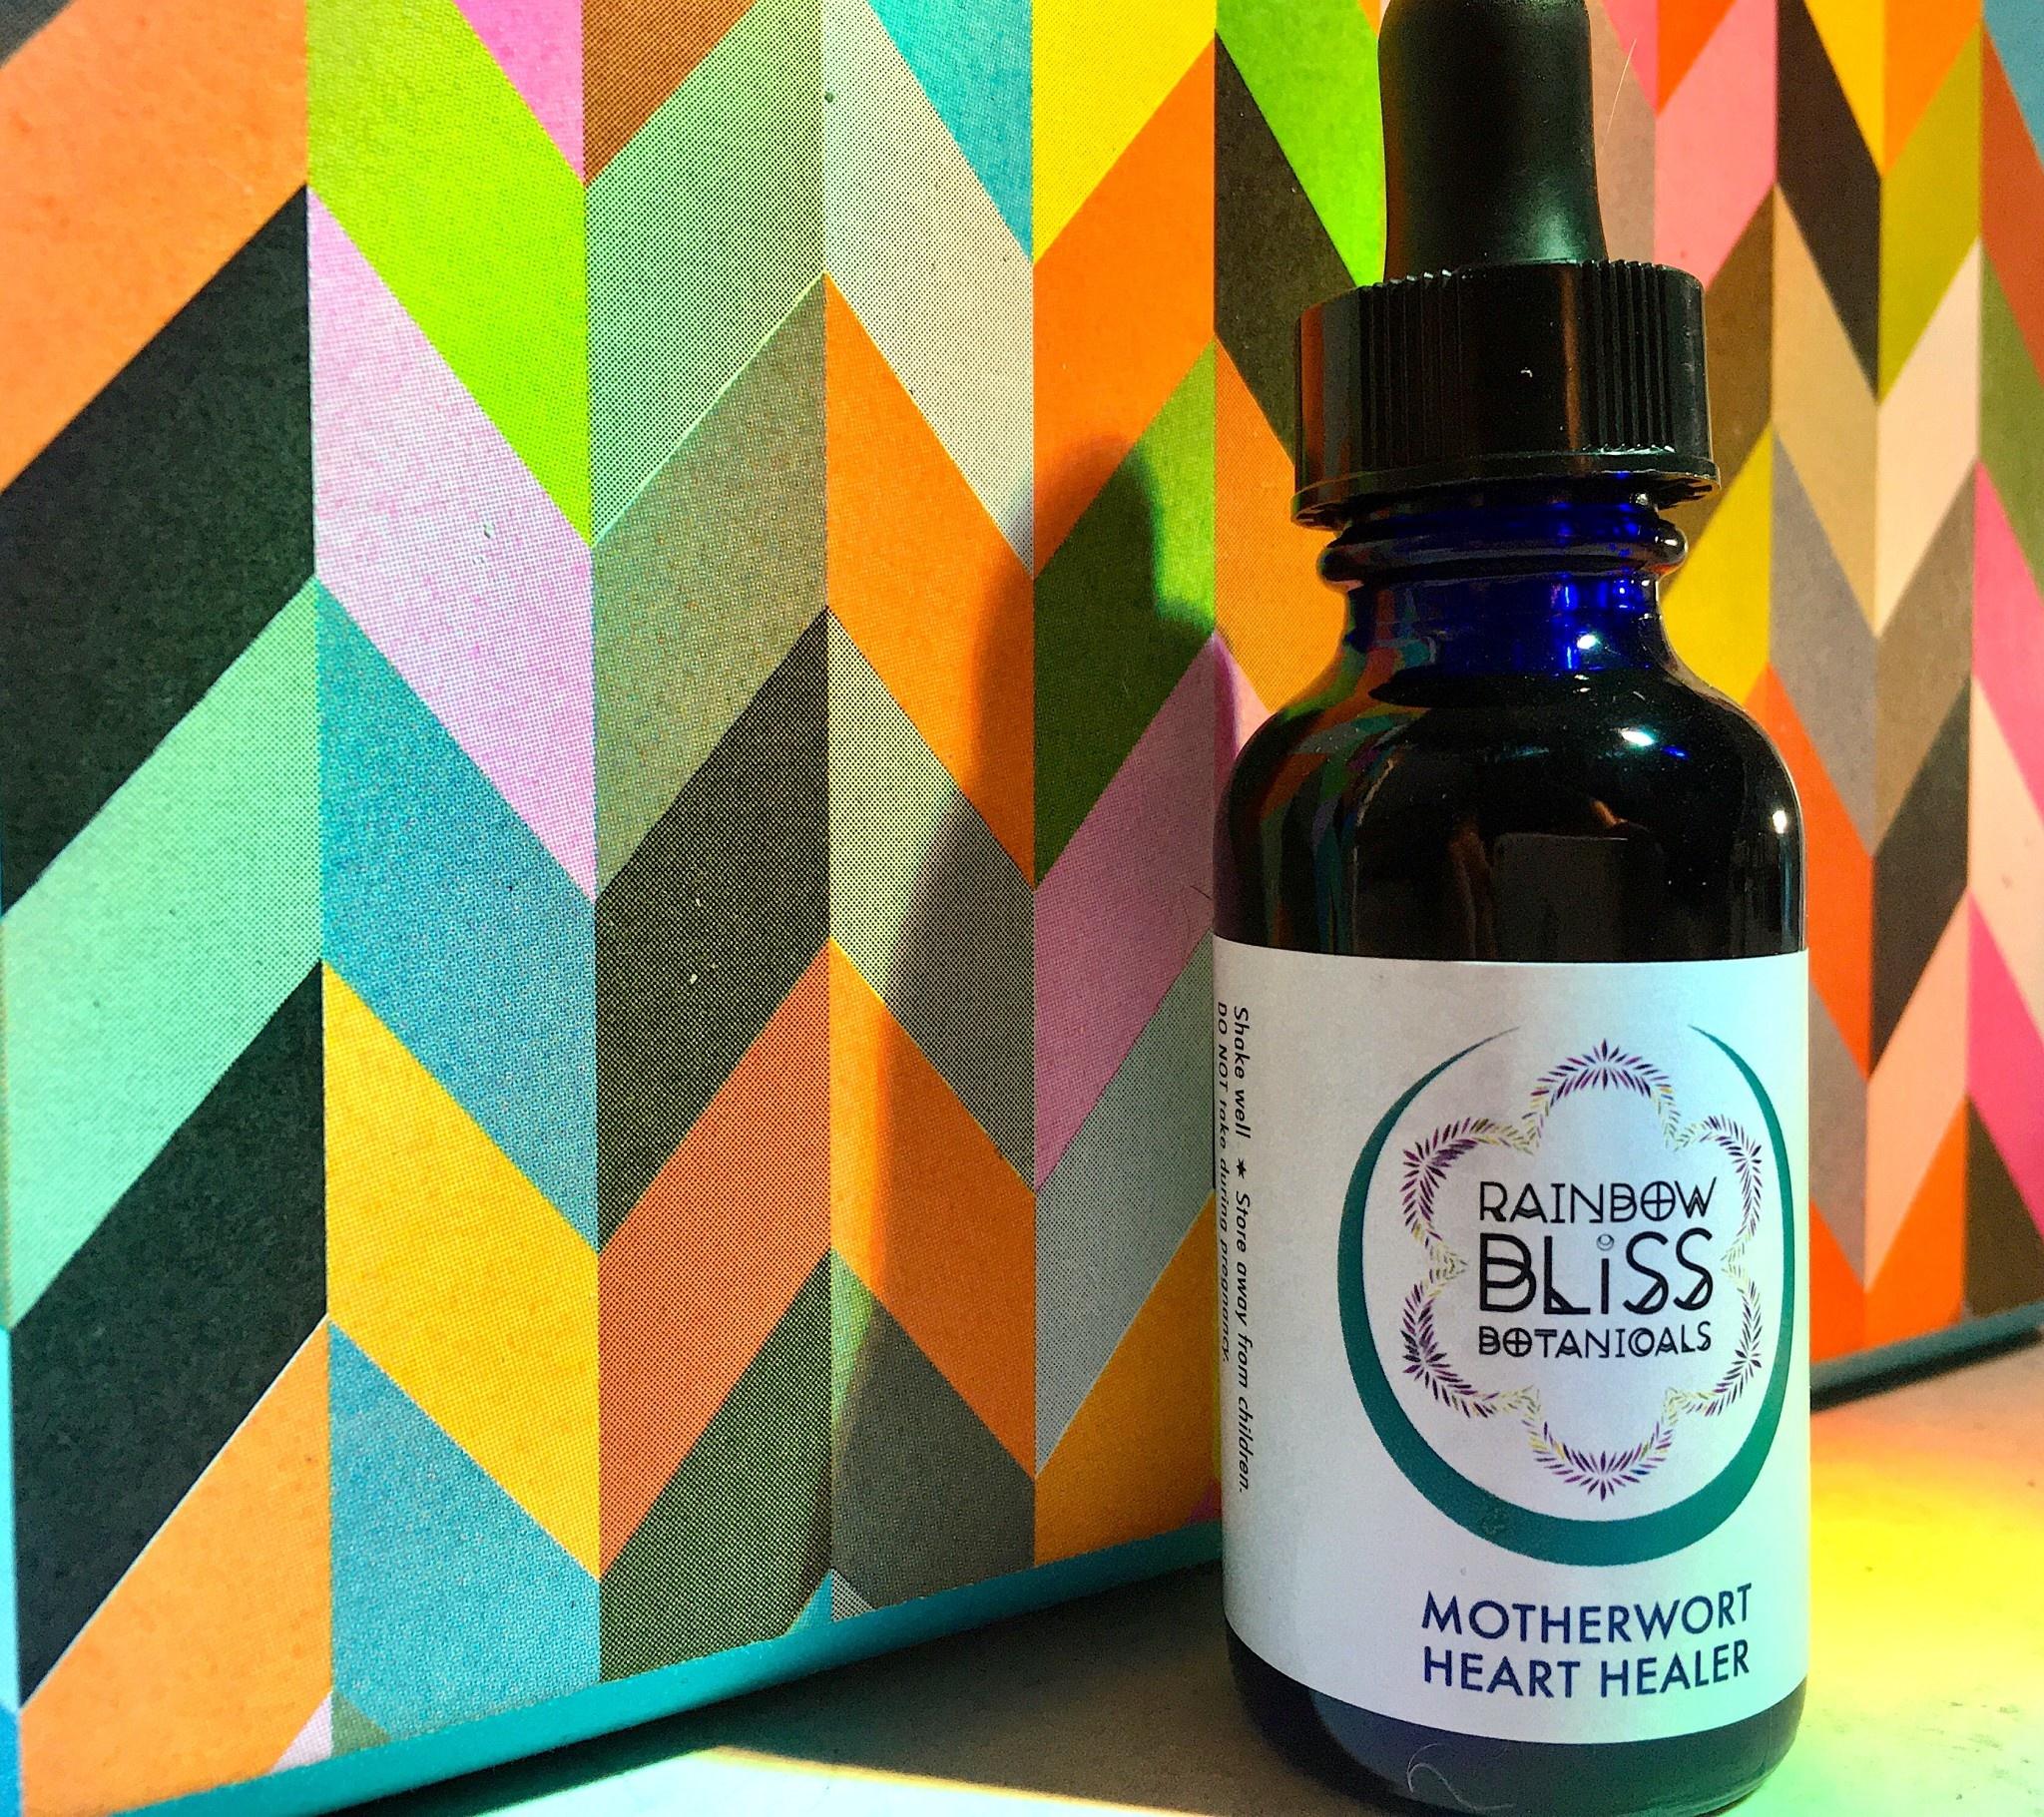 5223 - Tincture - Motherwort Heart Healer - 1oz - Rainbow Bliss-1